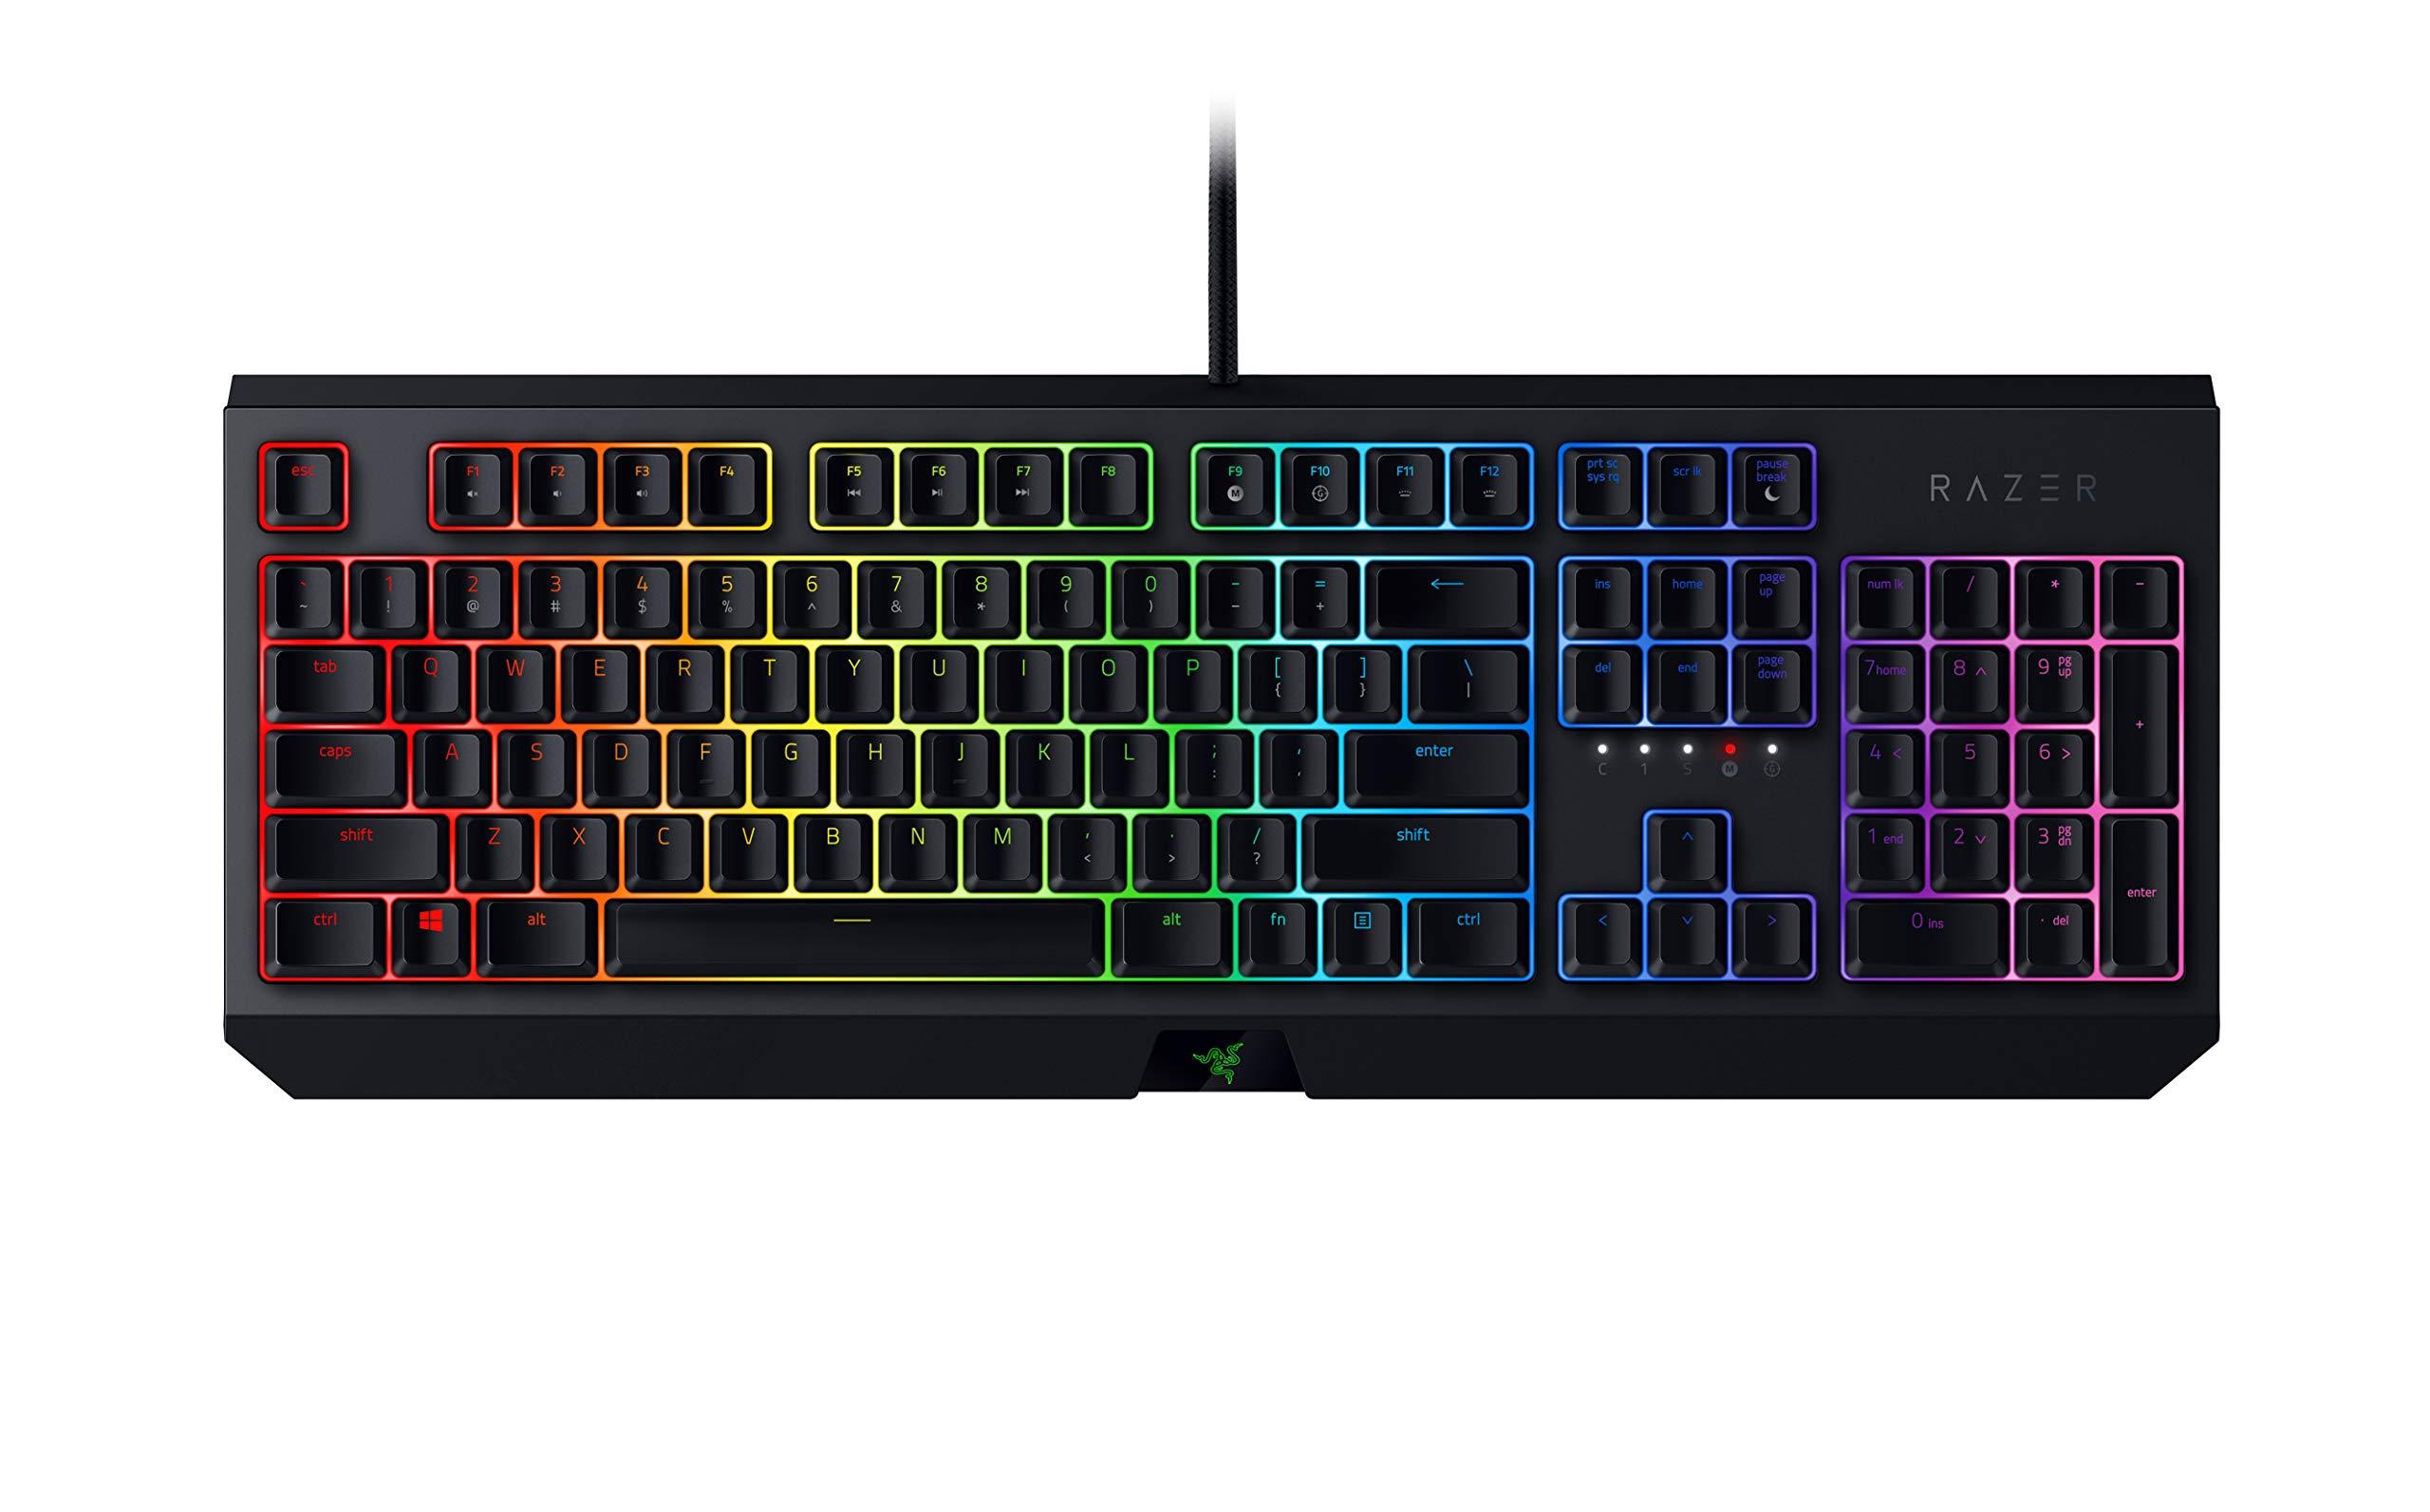 Razer BlackWidow Mechanical Gaming Keyboard 2019: Green Mechanical Switches - Tactile & Clicky - Chroma RGB Lighting - 10 Key Anti-Ghosting - Programmable Macro Functionality